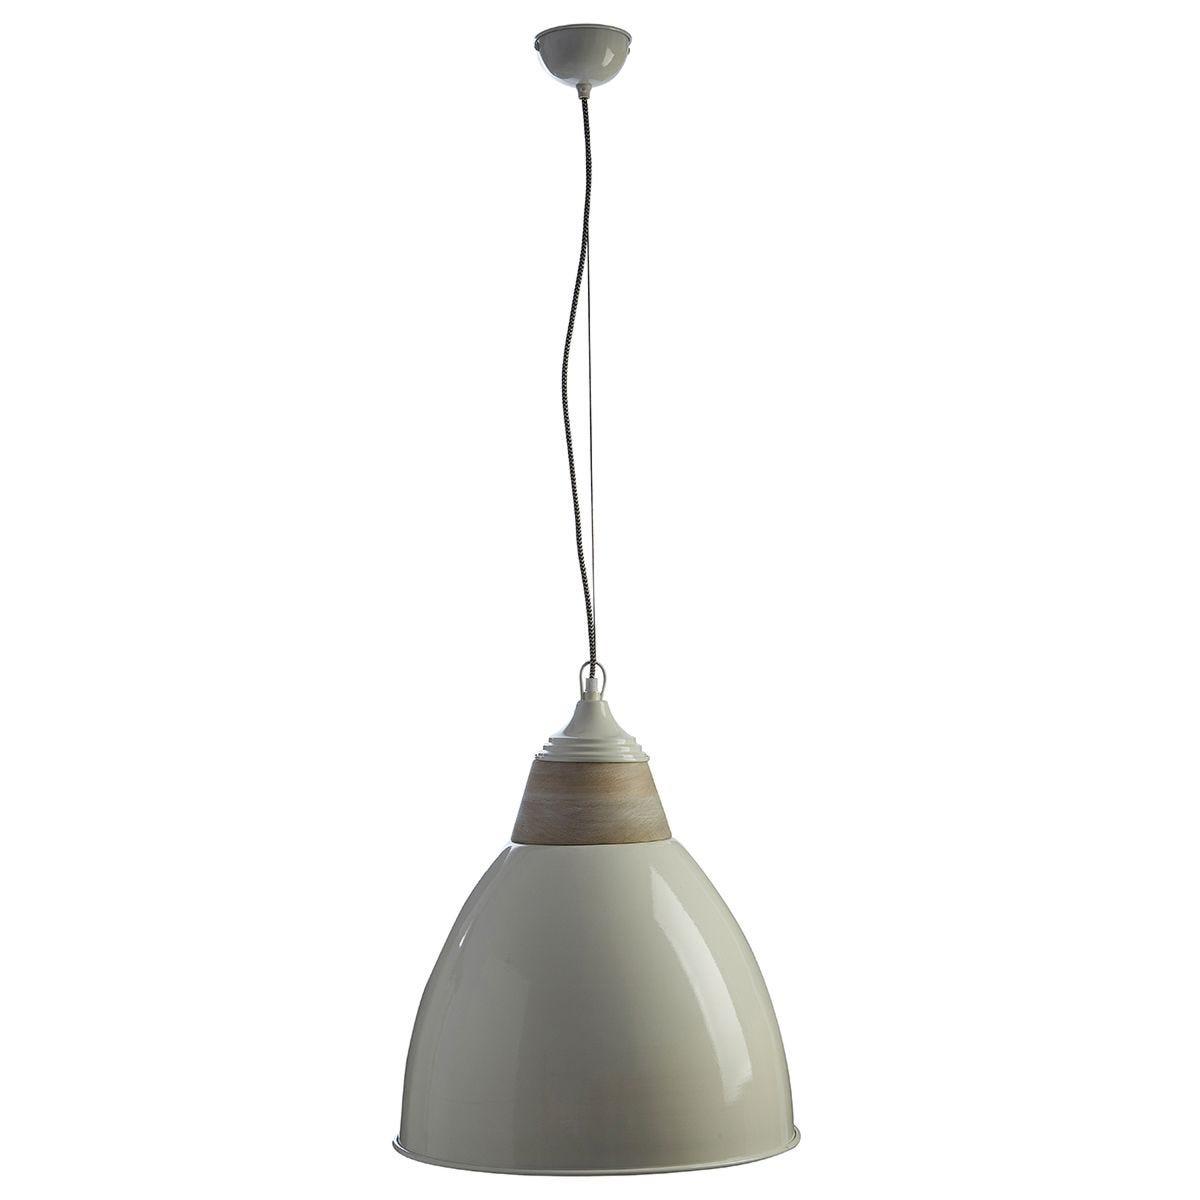 Premier Housewares Oslo Large Pendant Light in Iron/Wood - White